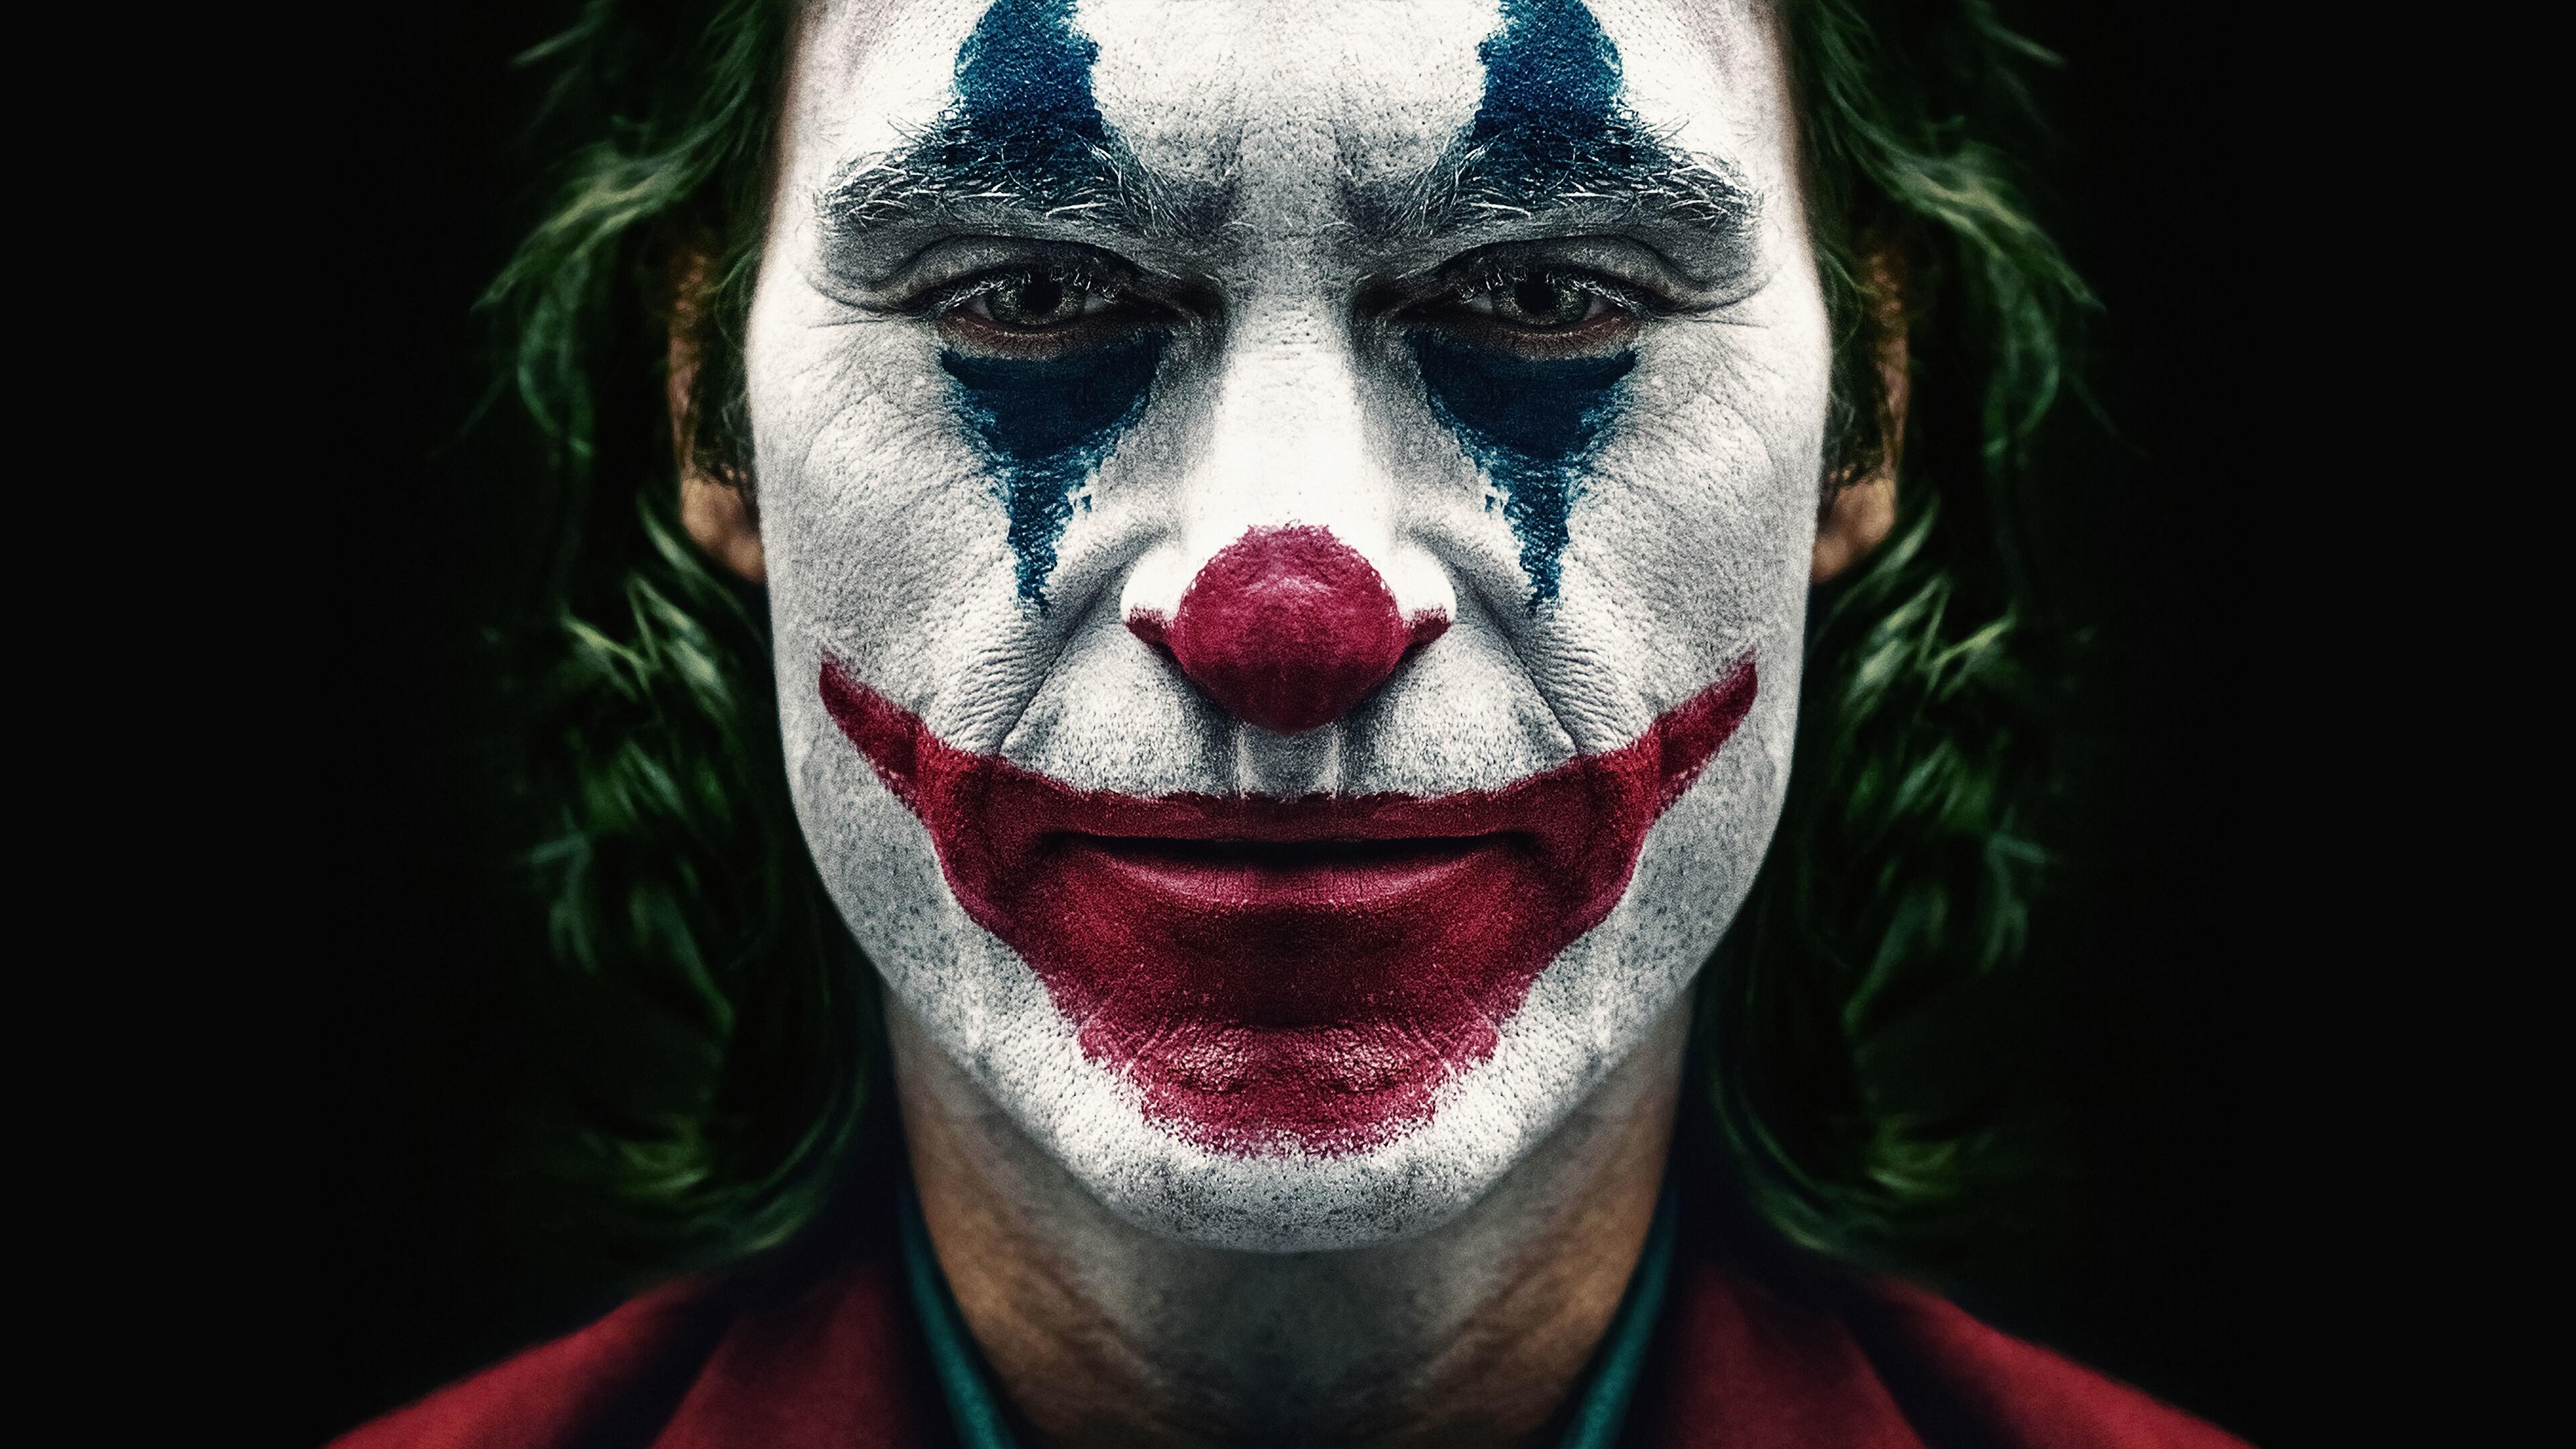 Joker 2019 Joaquin Phoenix Clown Hd Movies 4k Wallpapers